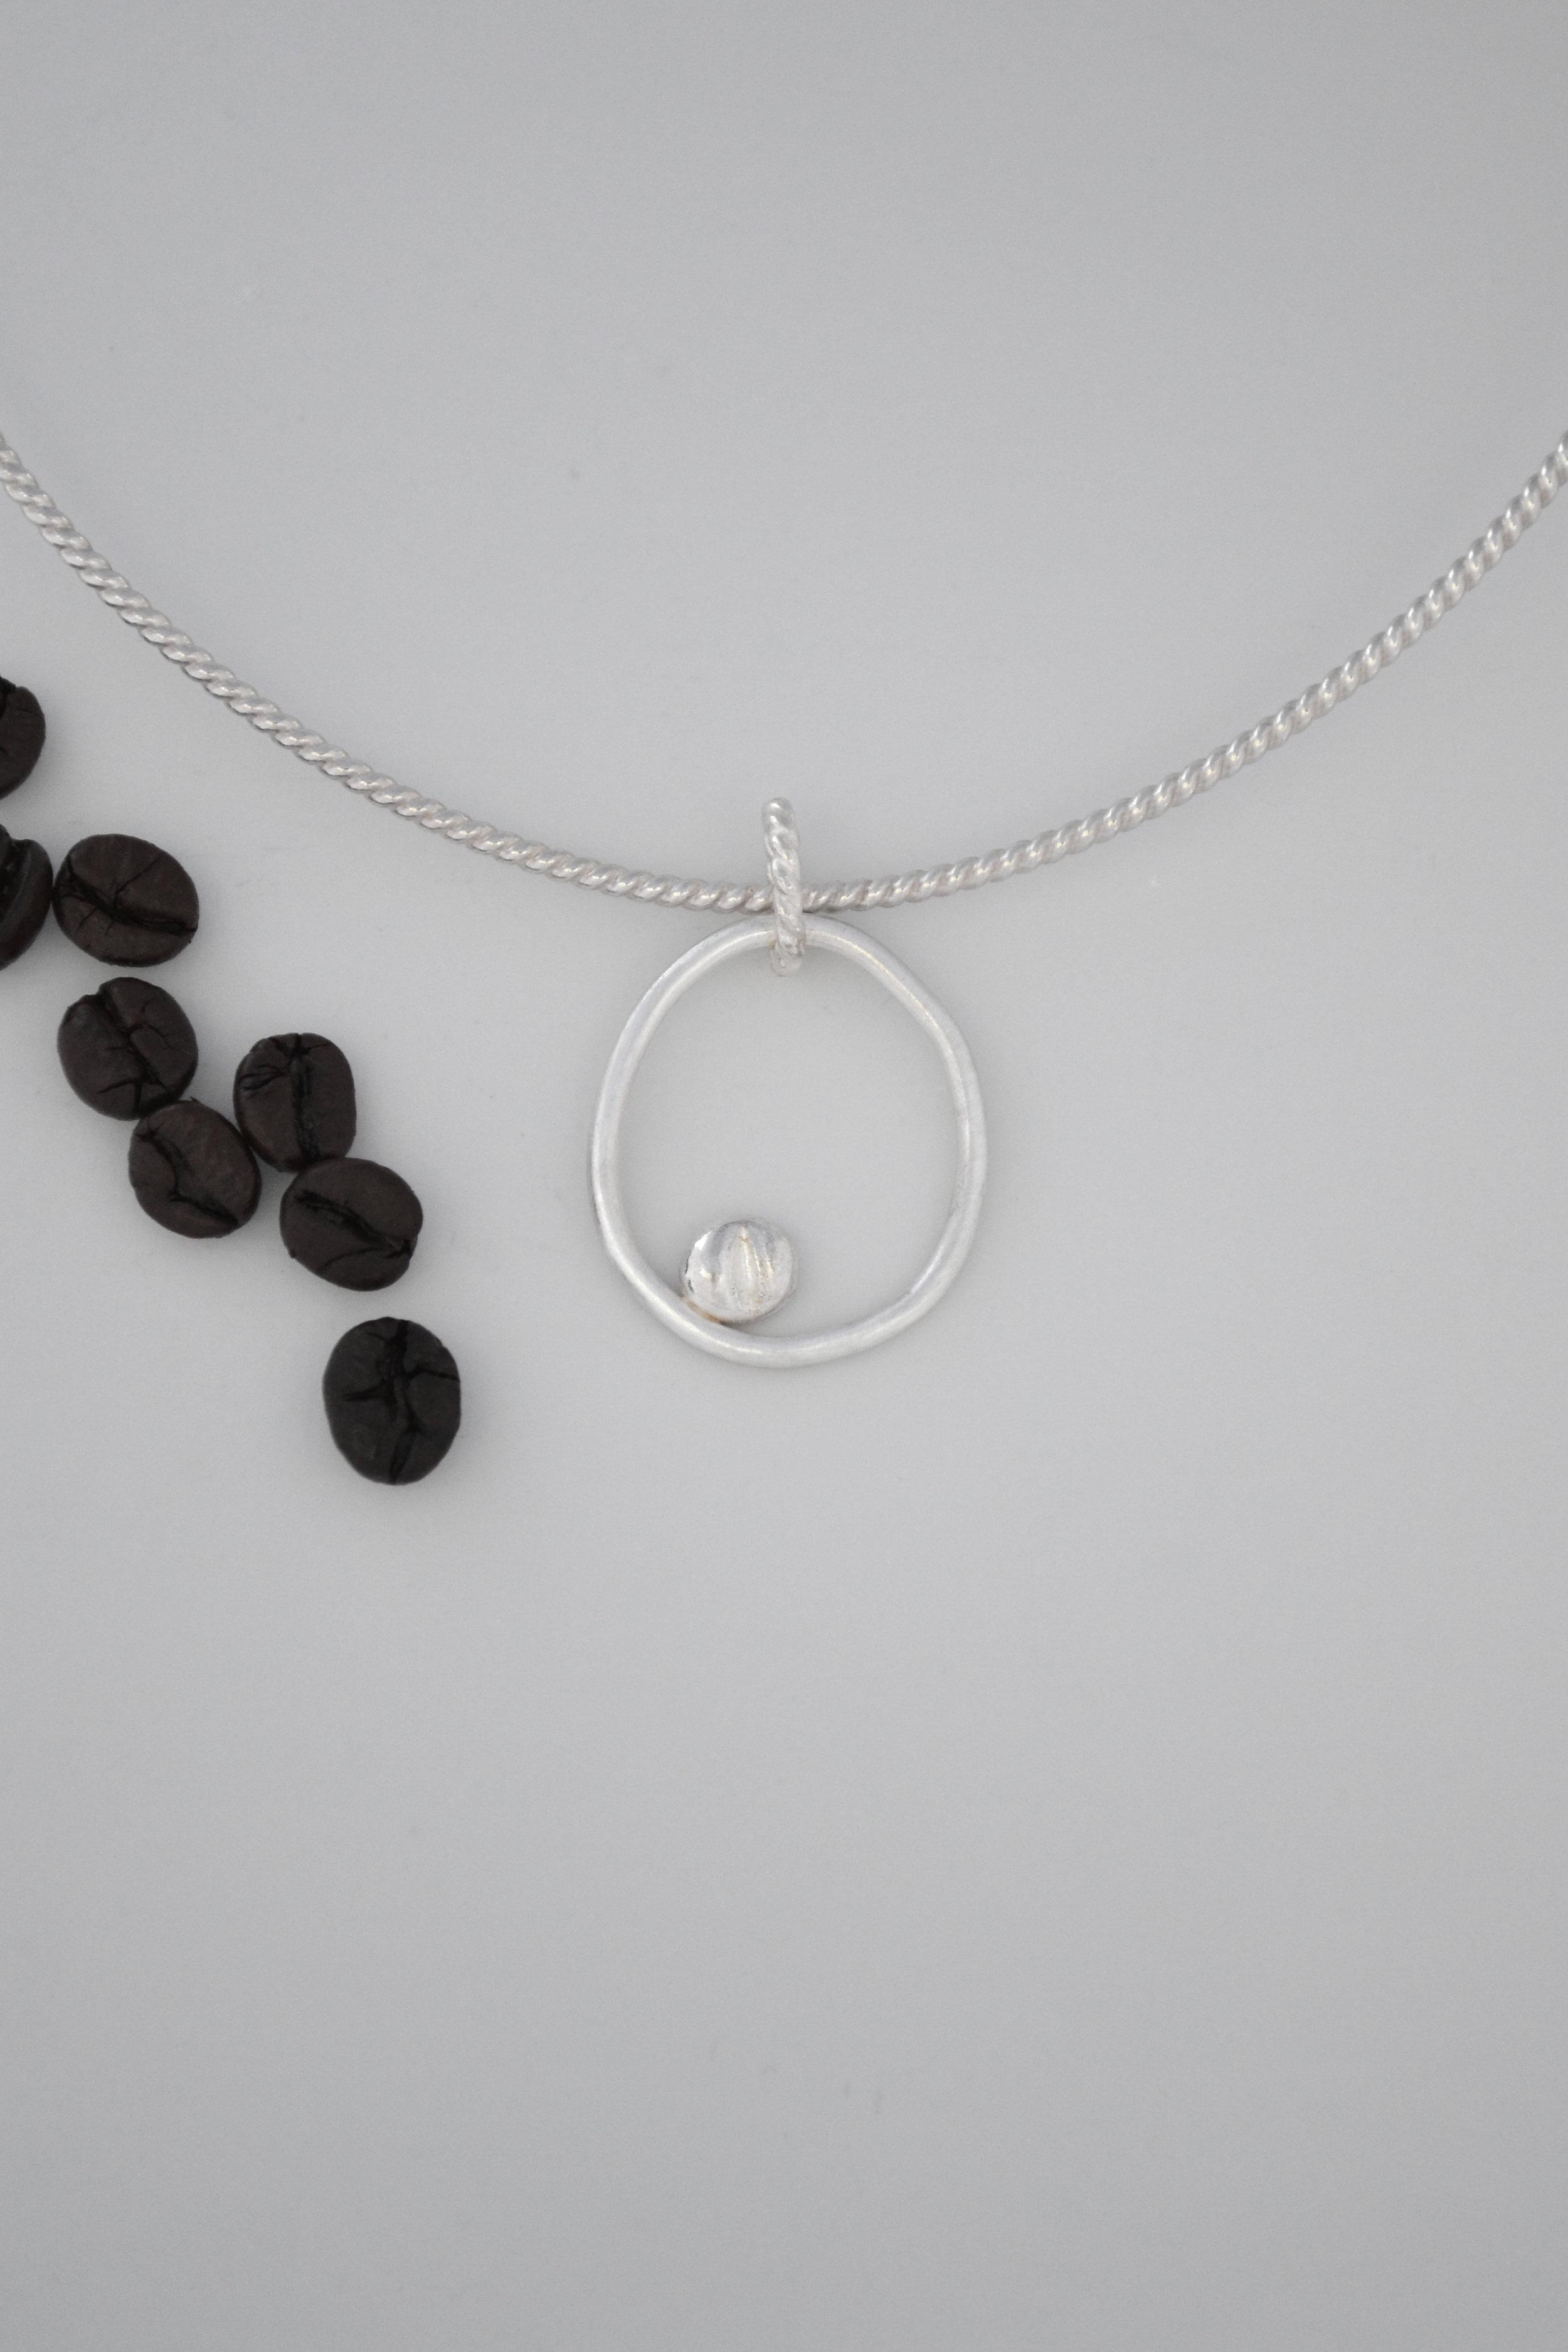 Silver Coffee Bean Pendant - lewdesigns.com.jpg